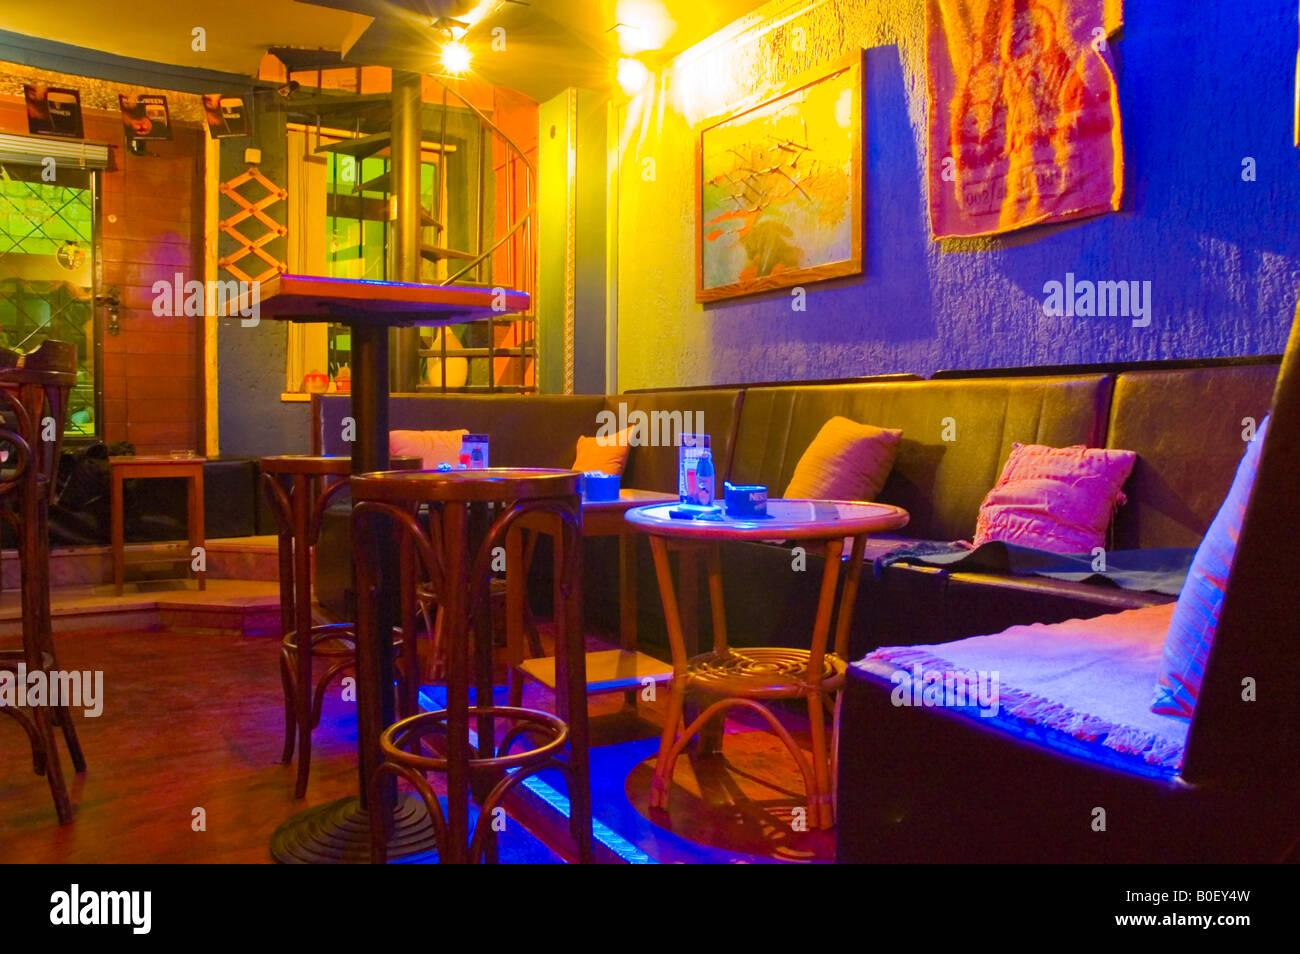 Bar in the old town quarter of Split Croatia Europe - Stock Image